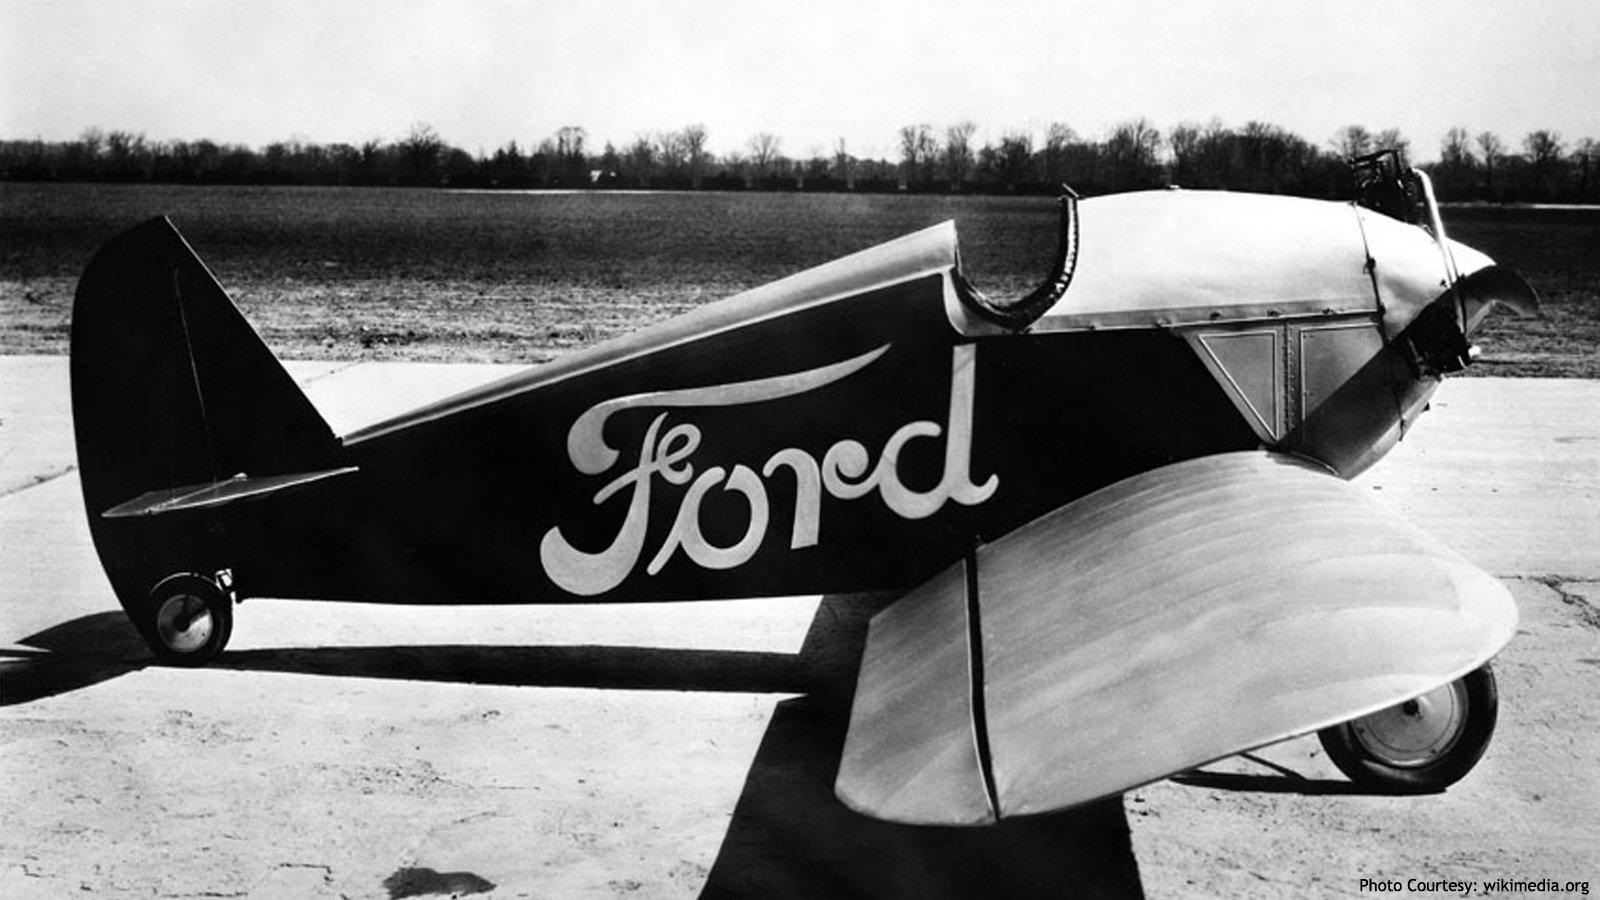 Ford Aircraft Division